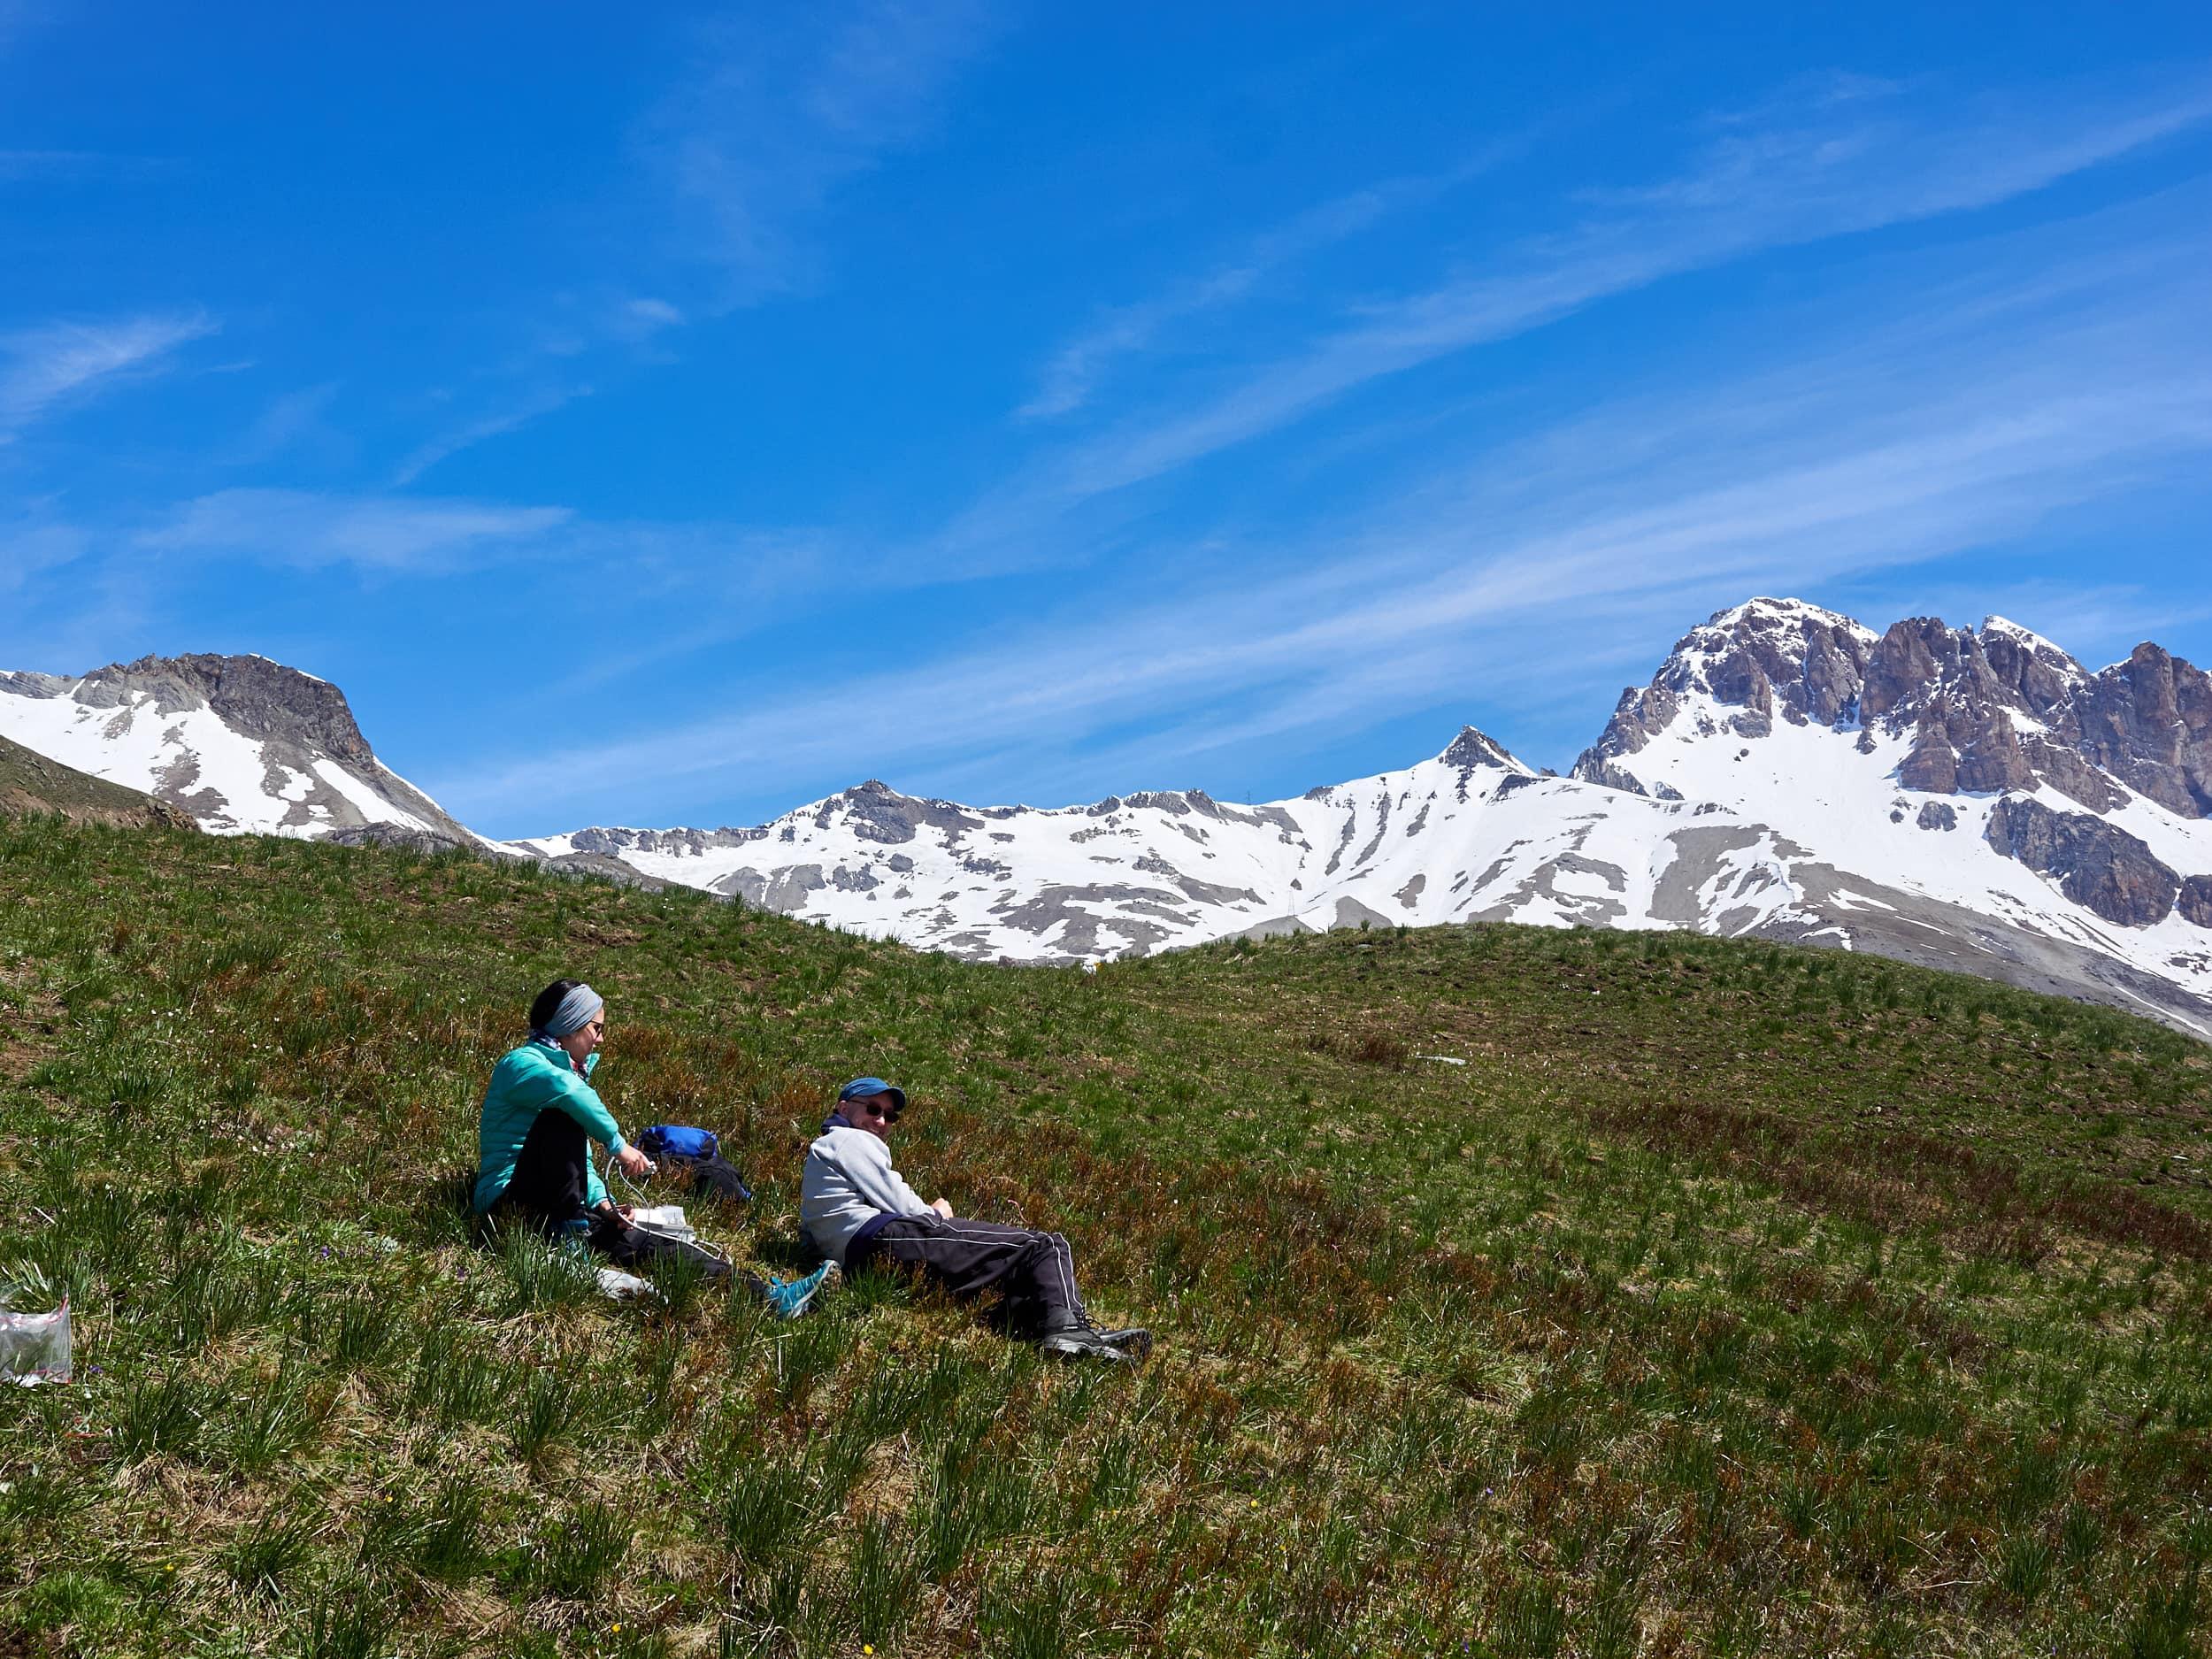 Measuring campaign in the Alps